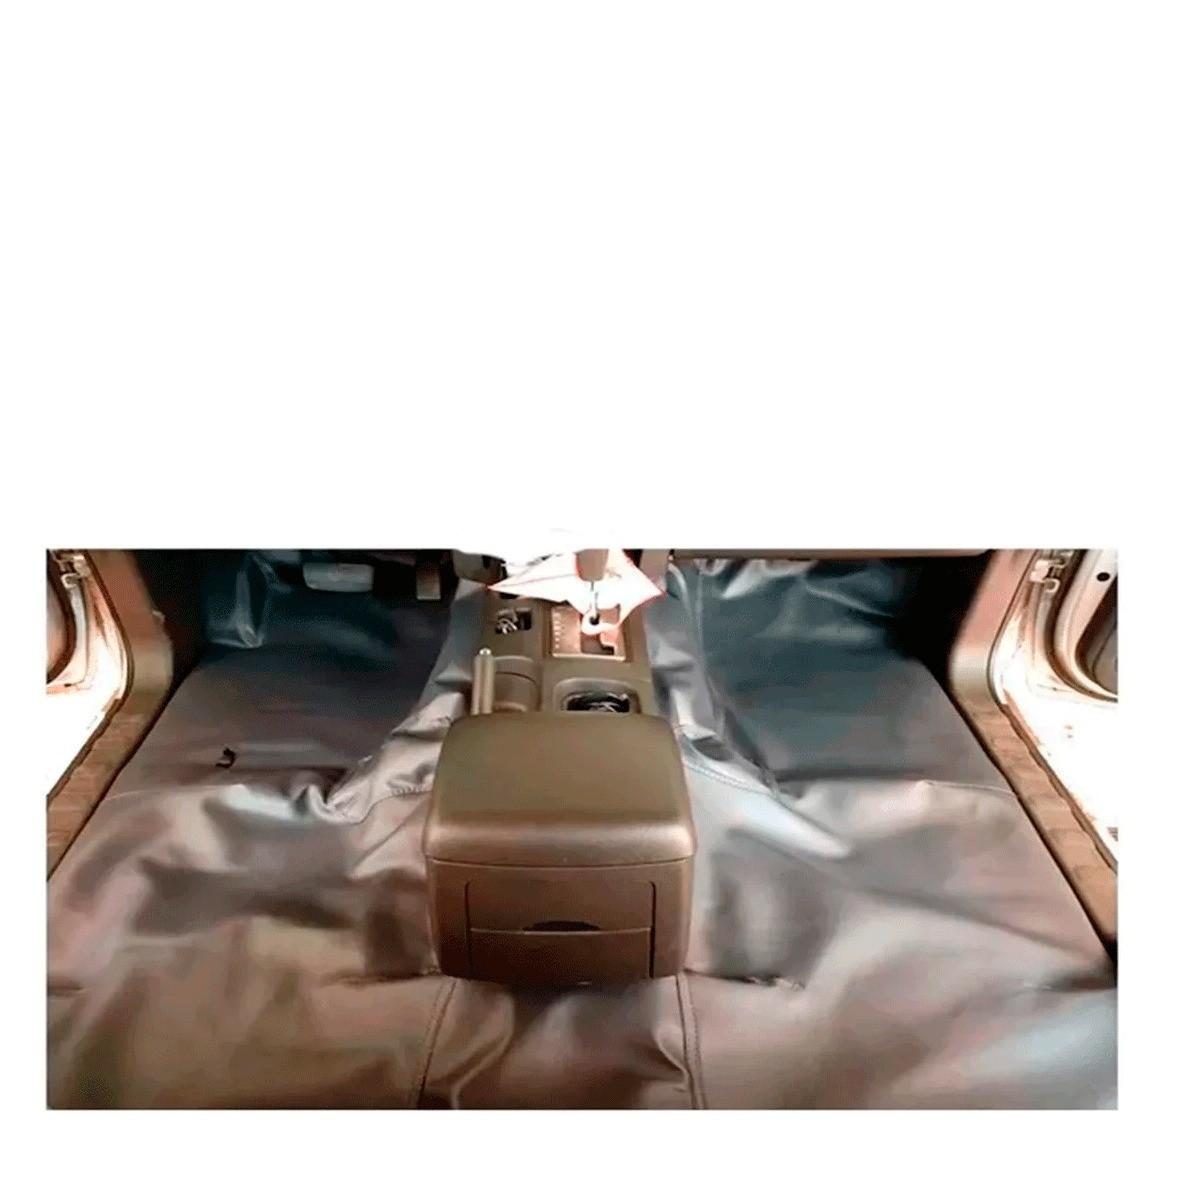 Tapete Automotivo Assoalho Emborrachado Bidim Ford F1000 F4000 Simples 93 a 1995